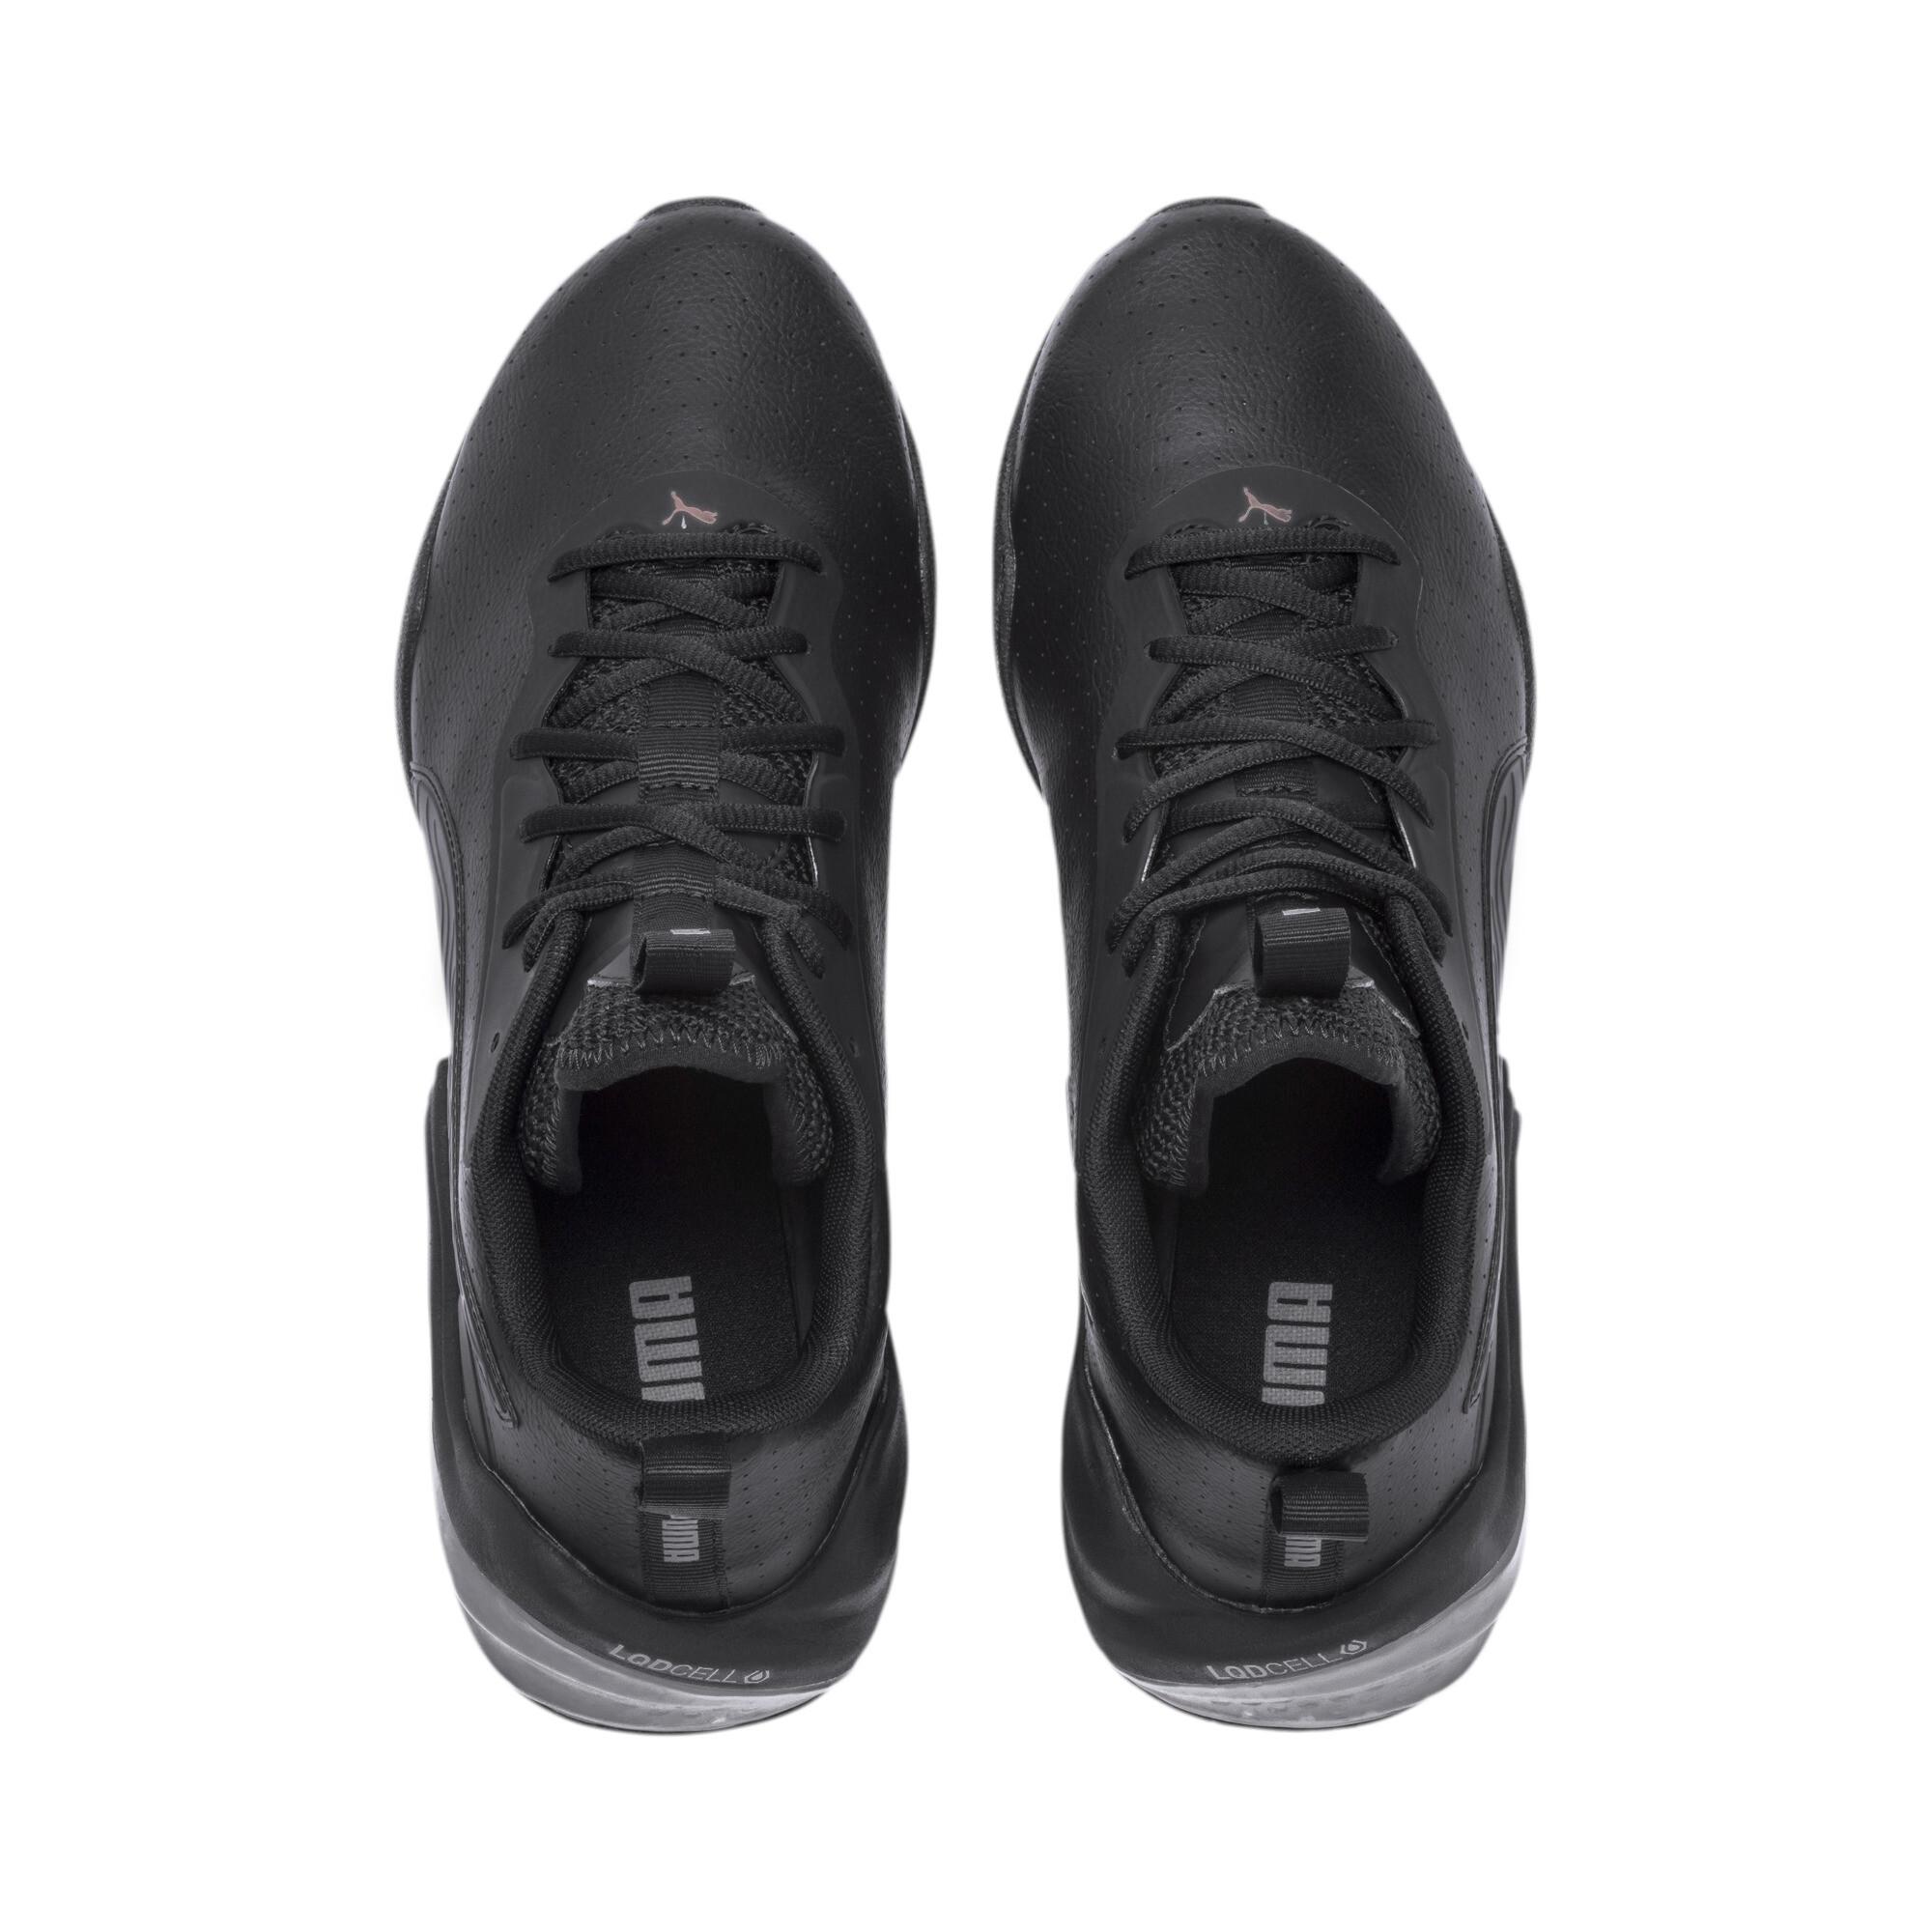 PUMA-Men-039-s-LQDCELL-Challenge-Perf-Training-Shoes thumbnail 15